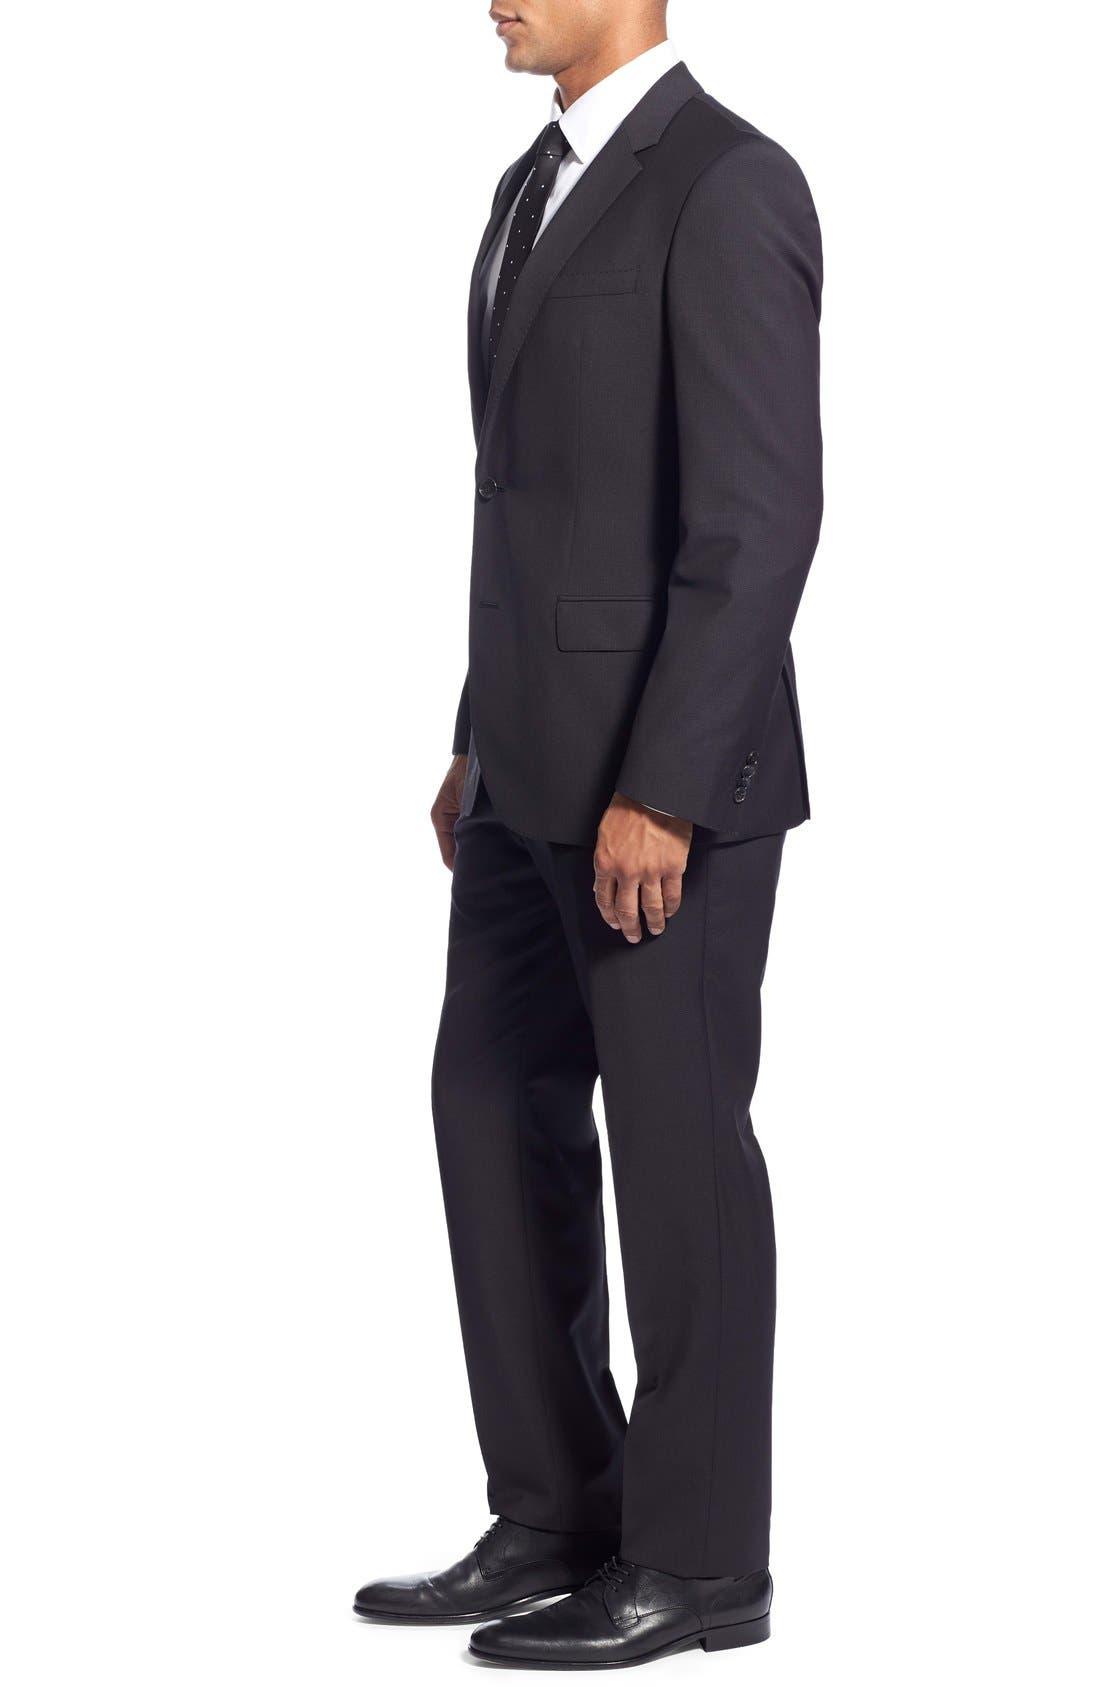 'Huge/Genius' Trim Fit Solid Wool Suit,                             Alternate thumbnail 13, color,                             BLACK